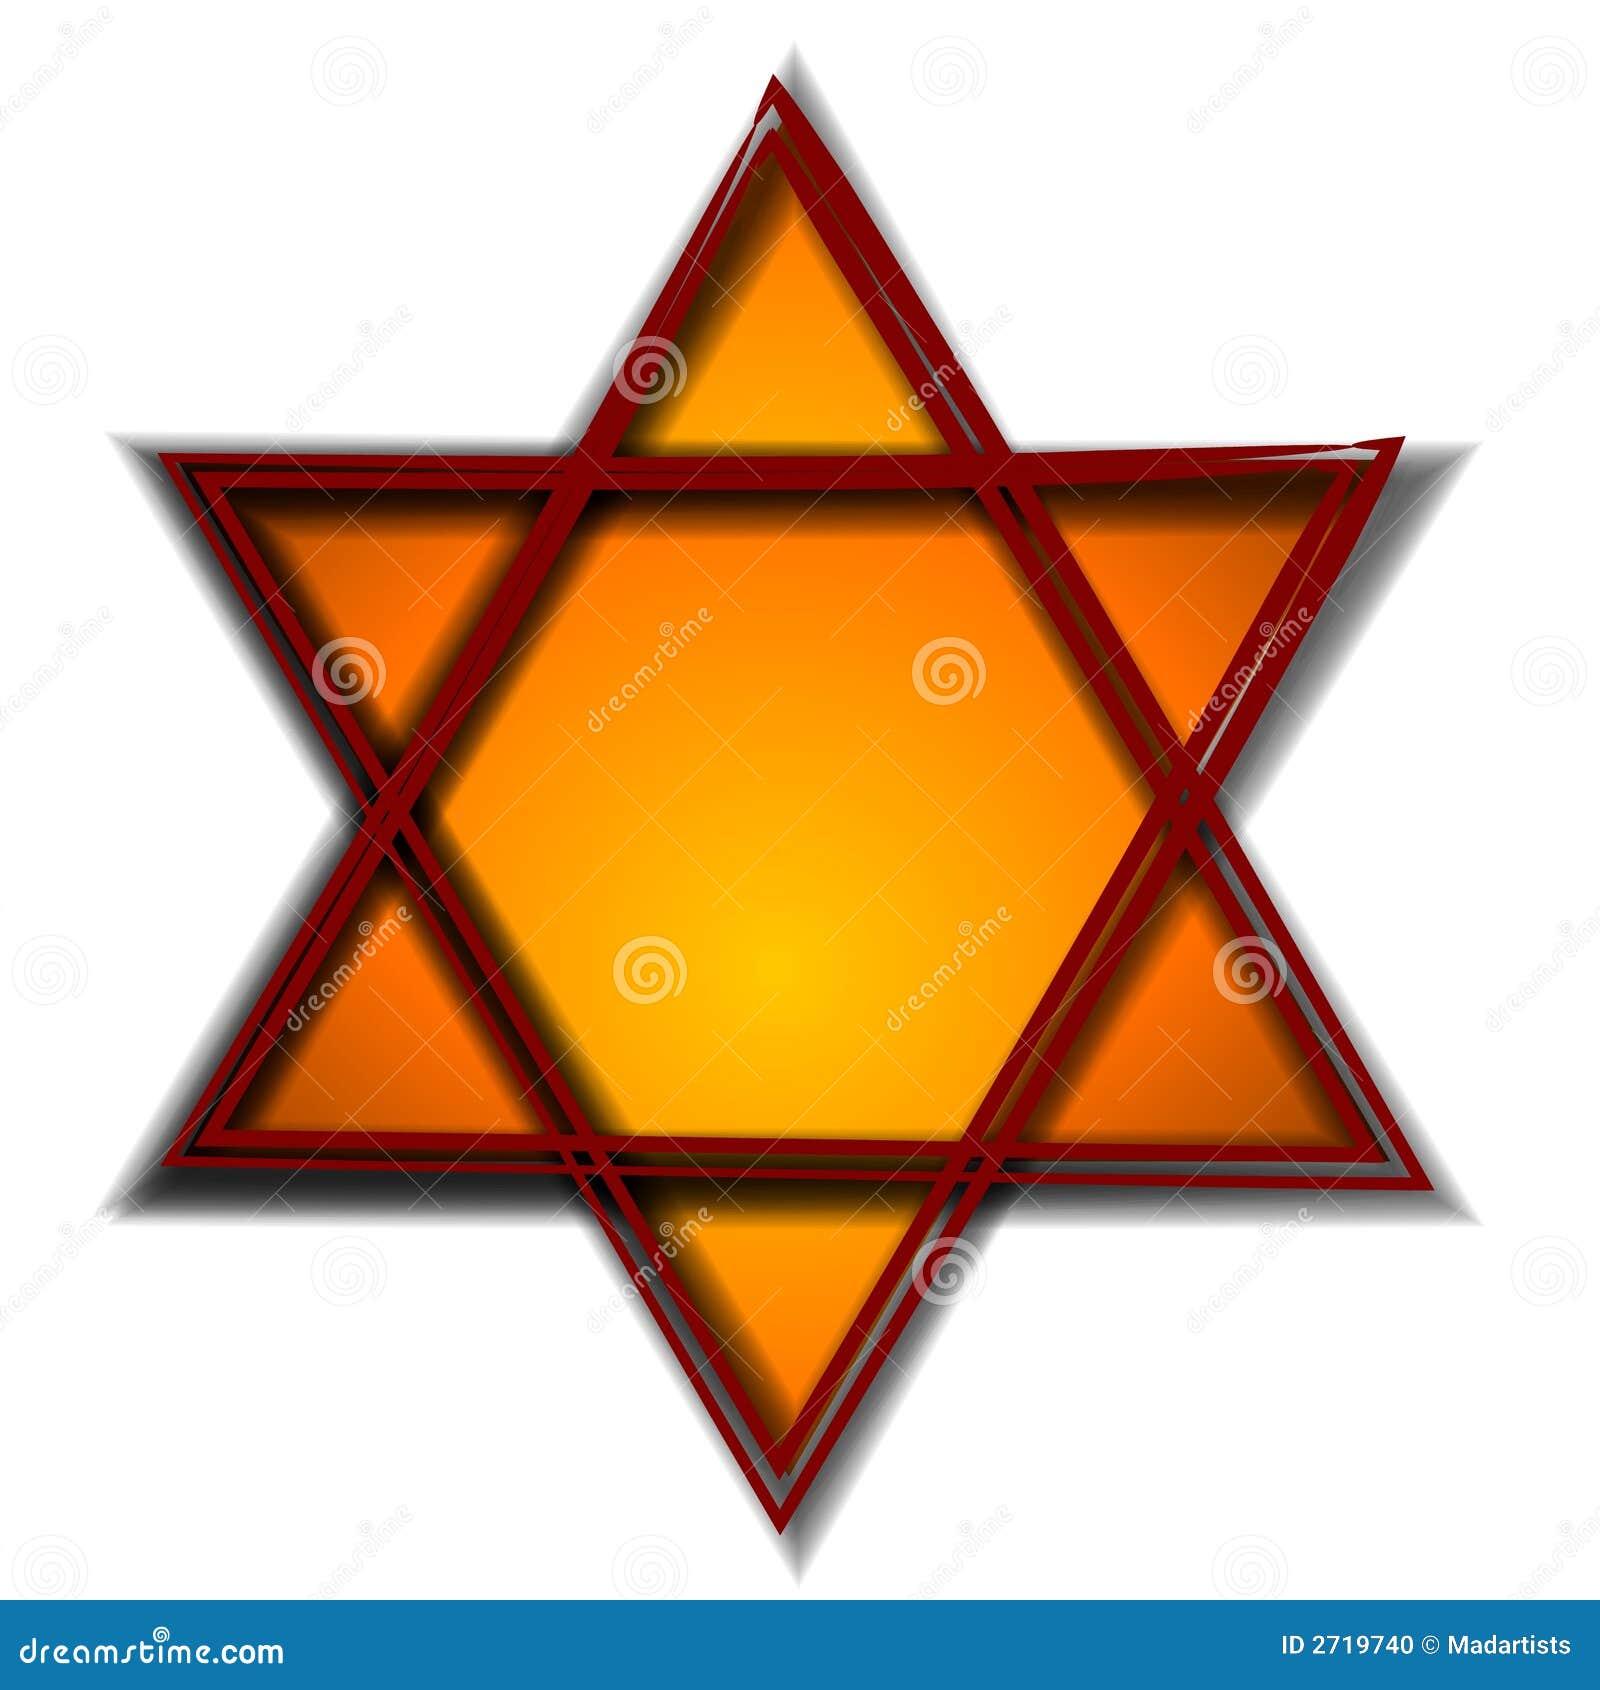 Symbole de Hexagram en or rouge